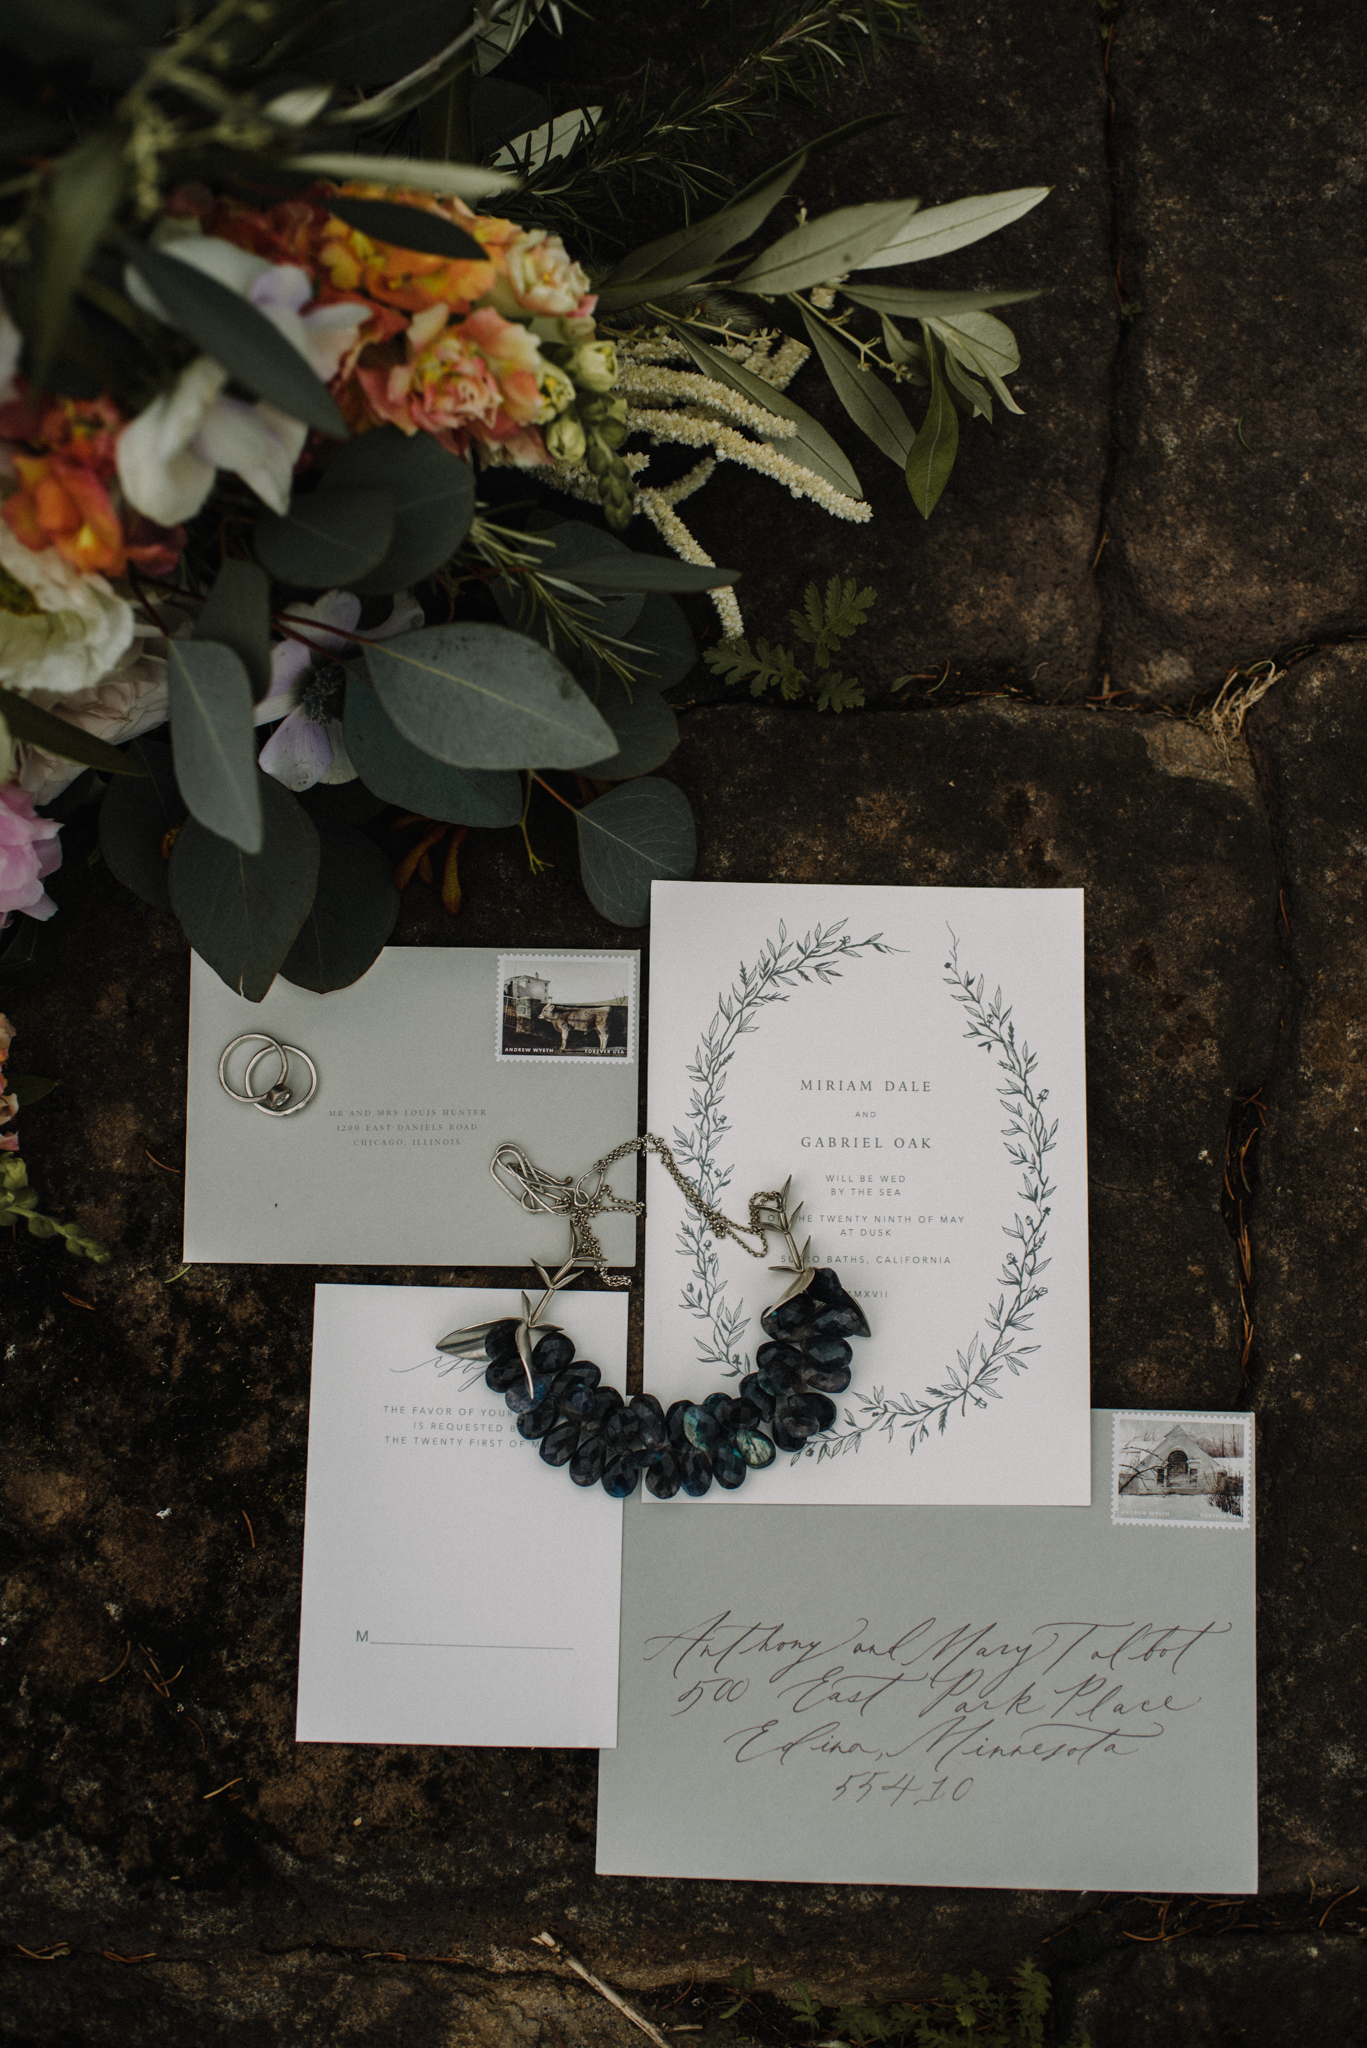 Madeira Creative - Clare Kolars - Emilee Bridal Portraits - White Sails Photography - North Shore - Lake Superior_78.JPG